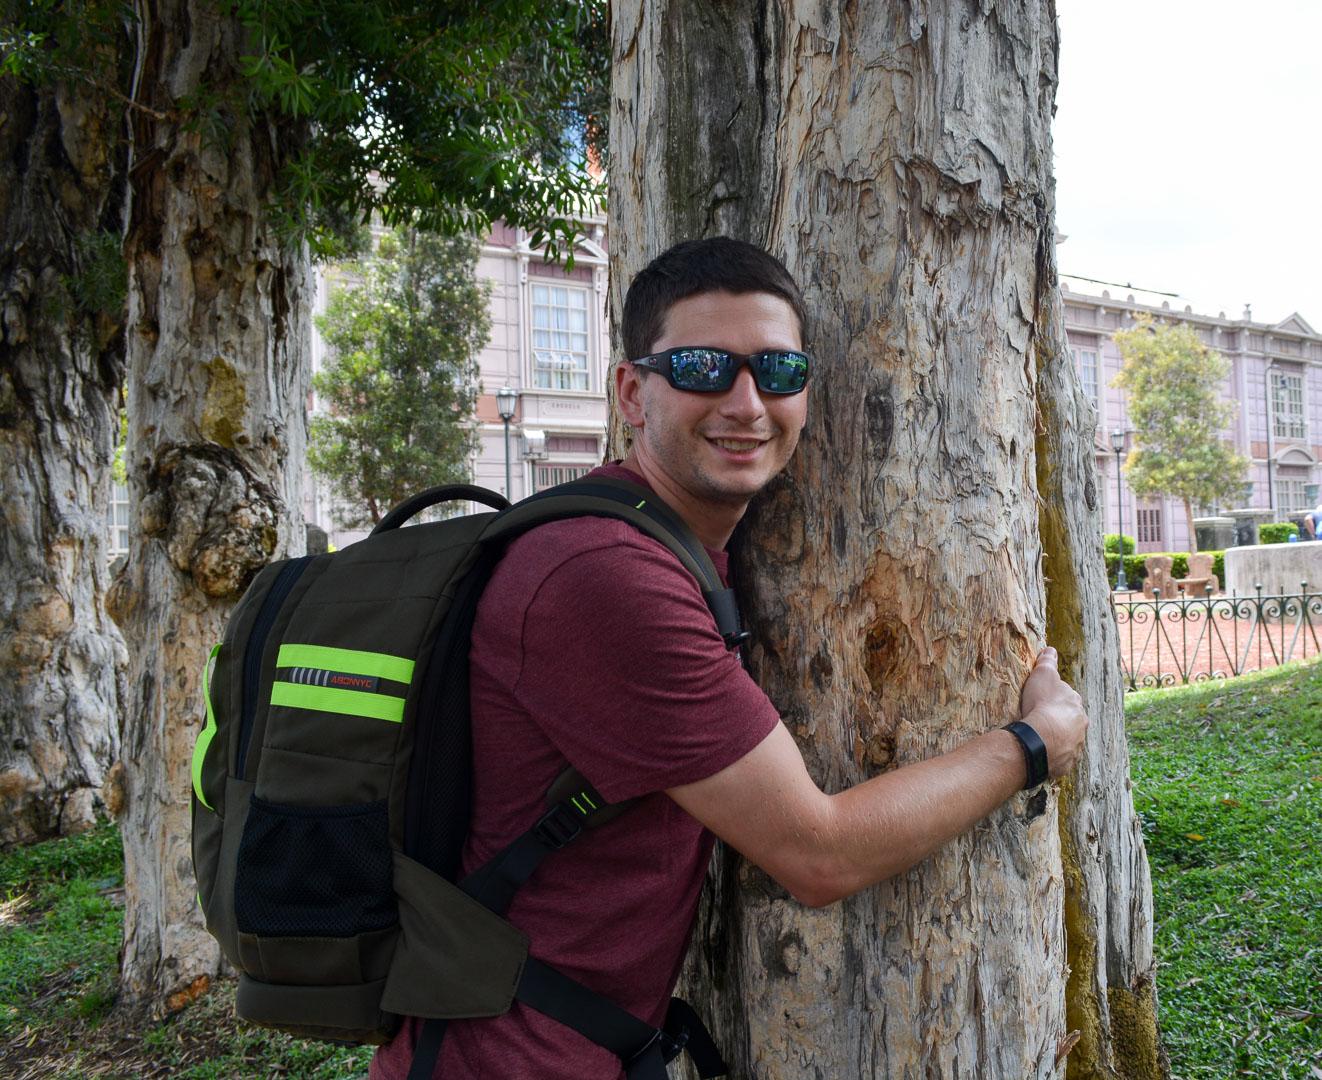 The very huggable cork tree